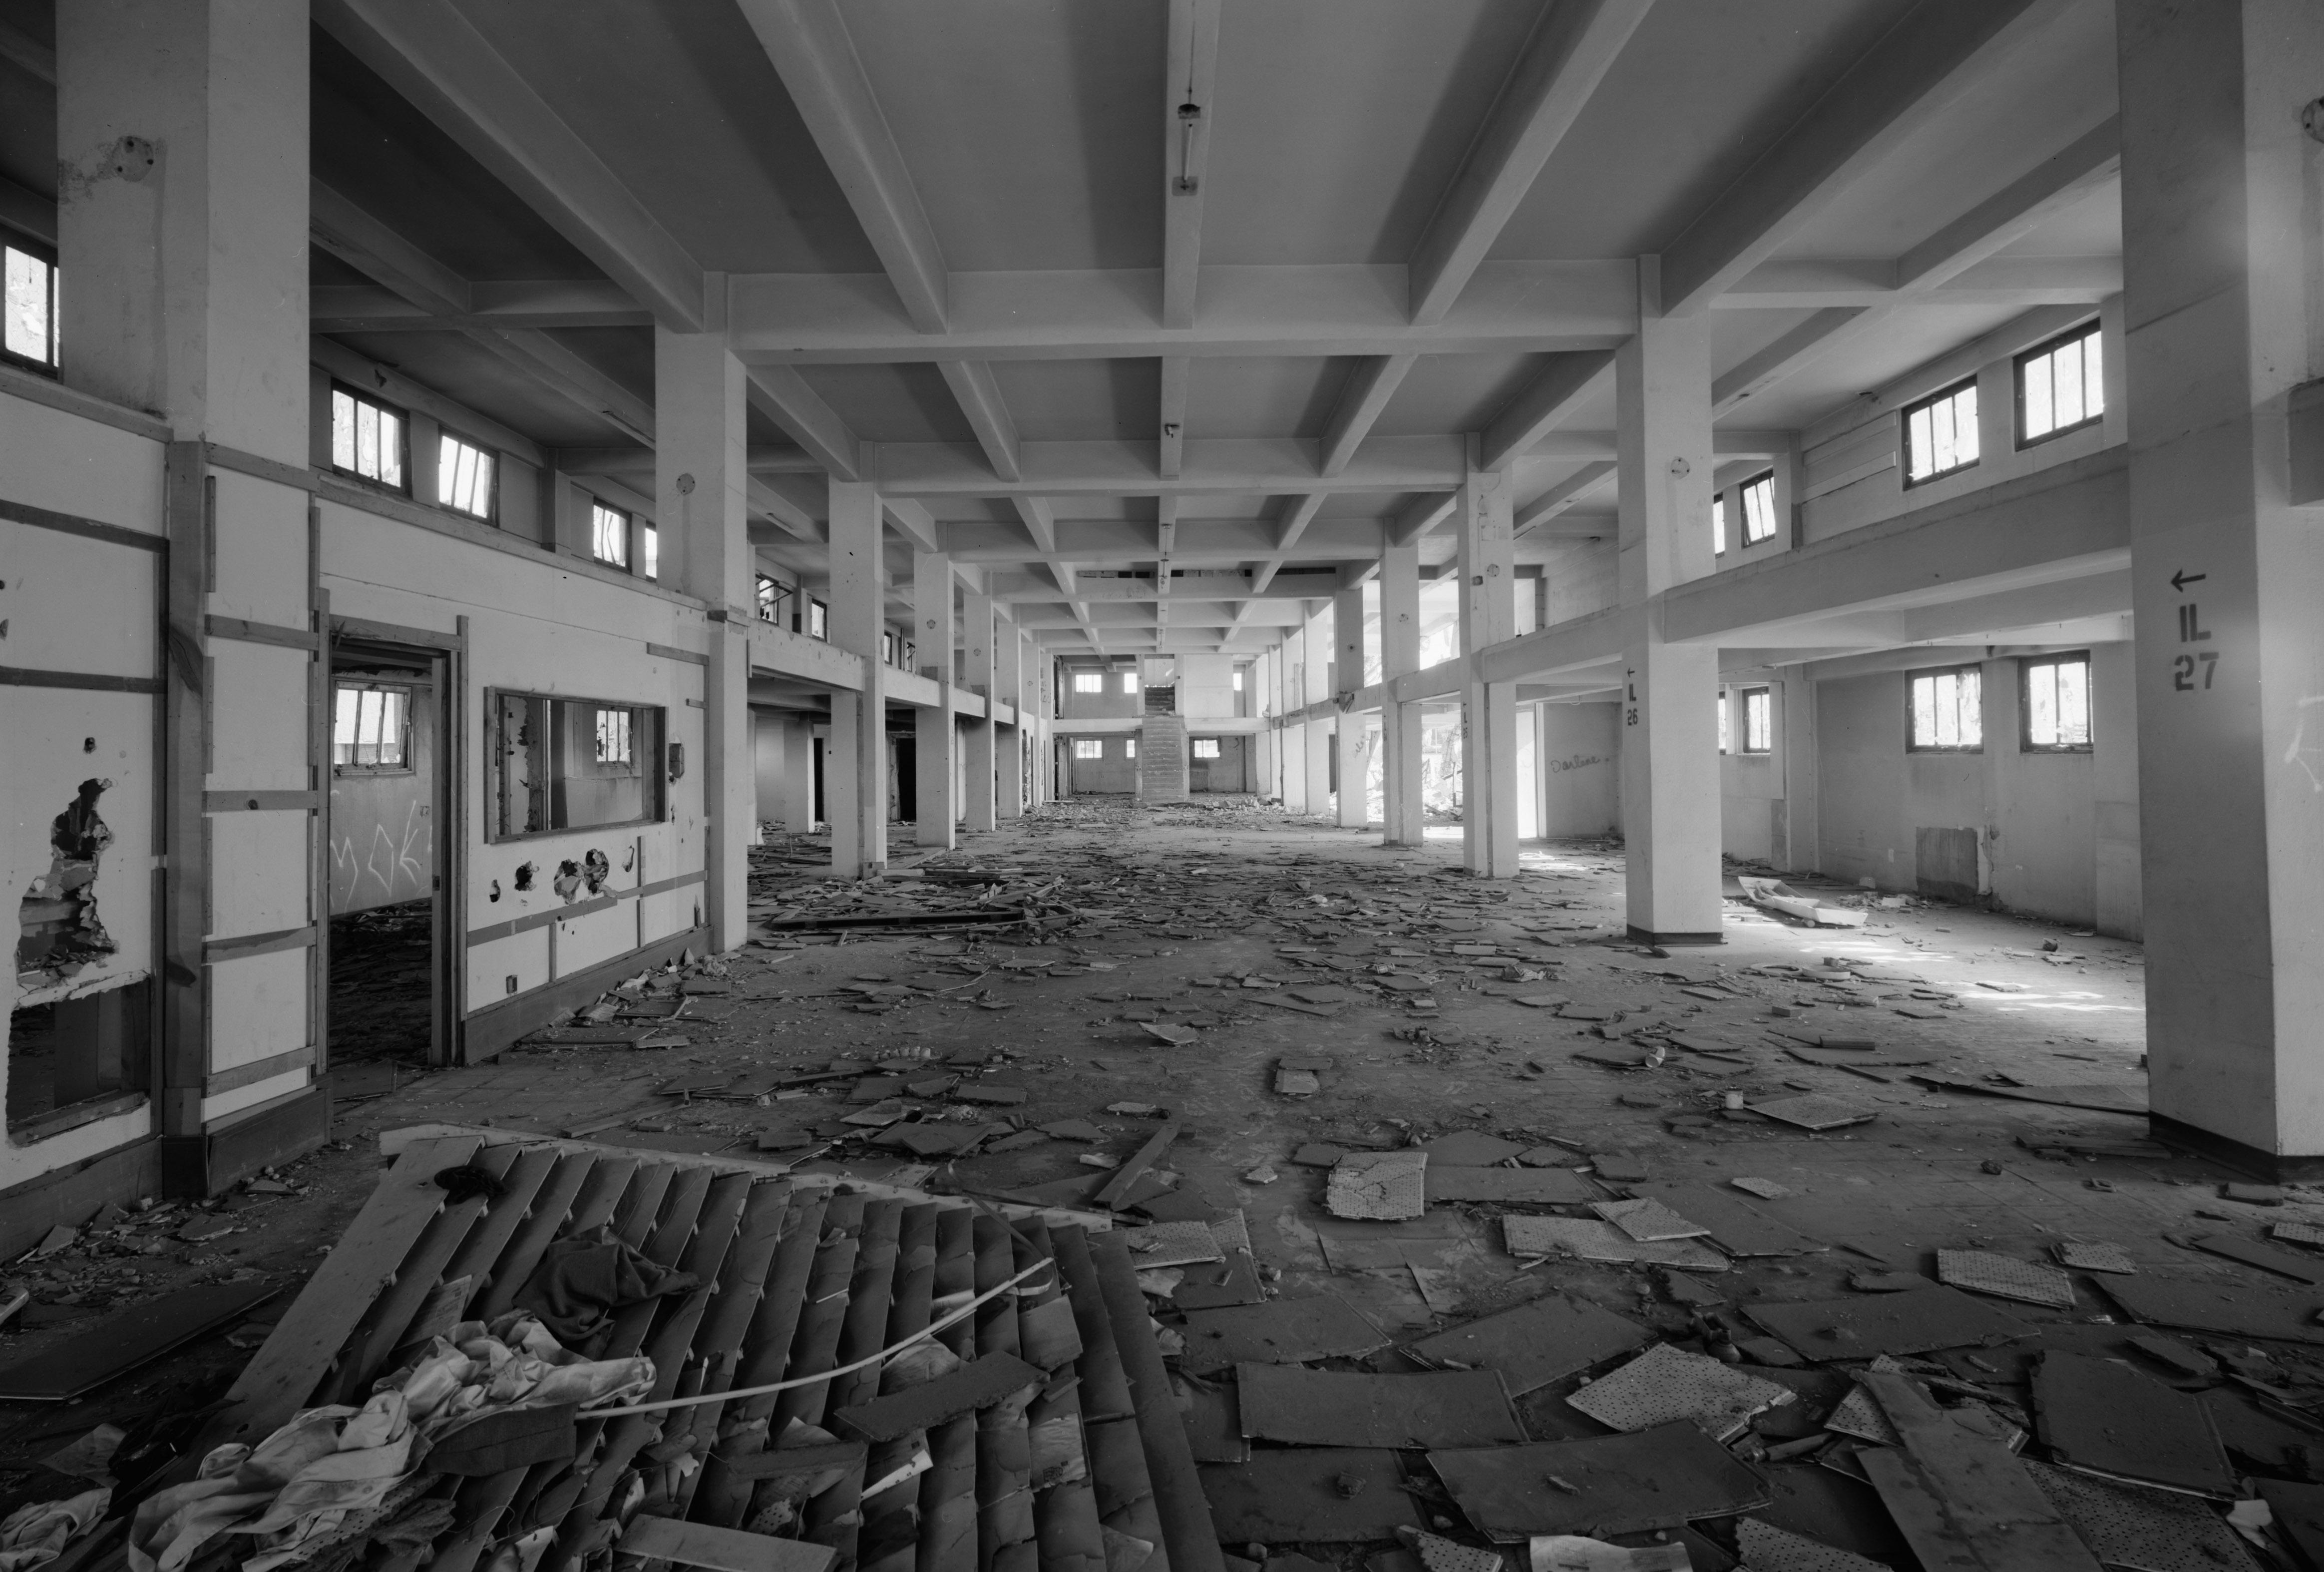 Interior of Abandoned building in Albuquerque, New Mexico image ...